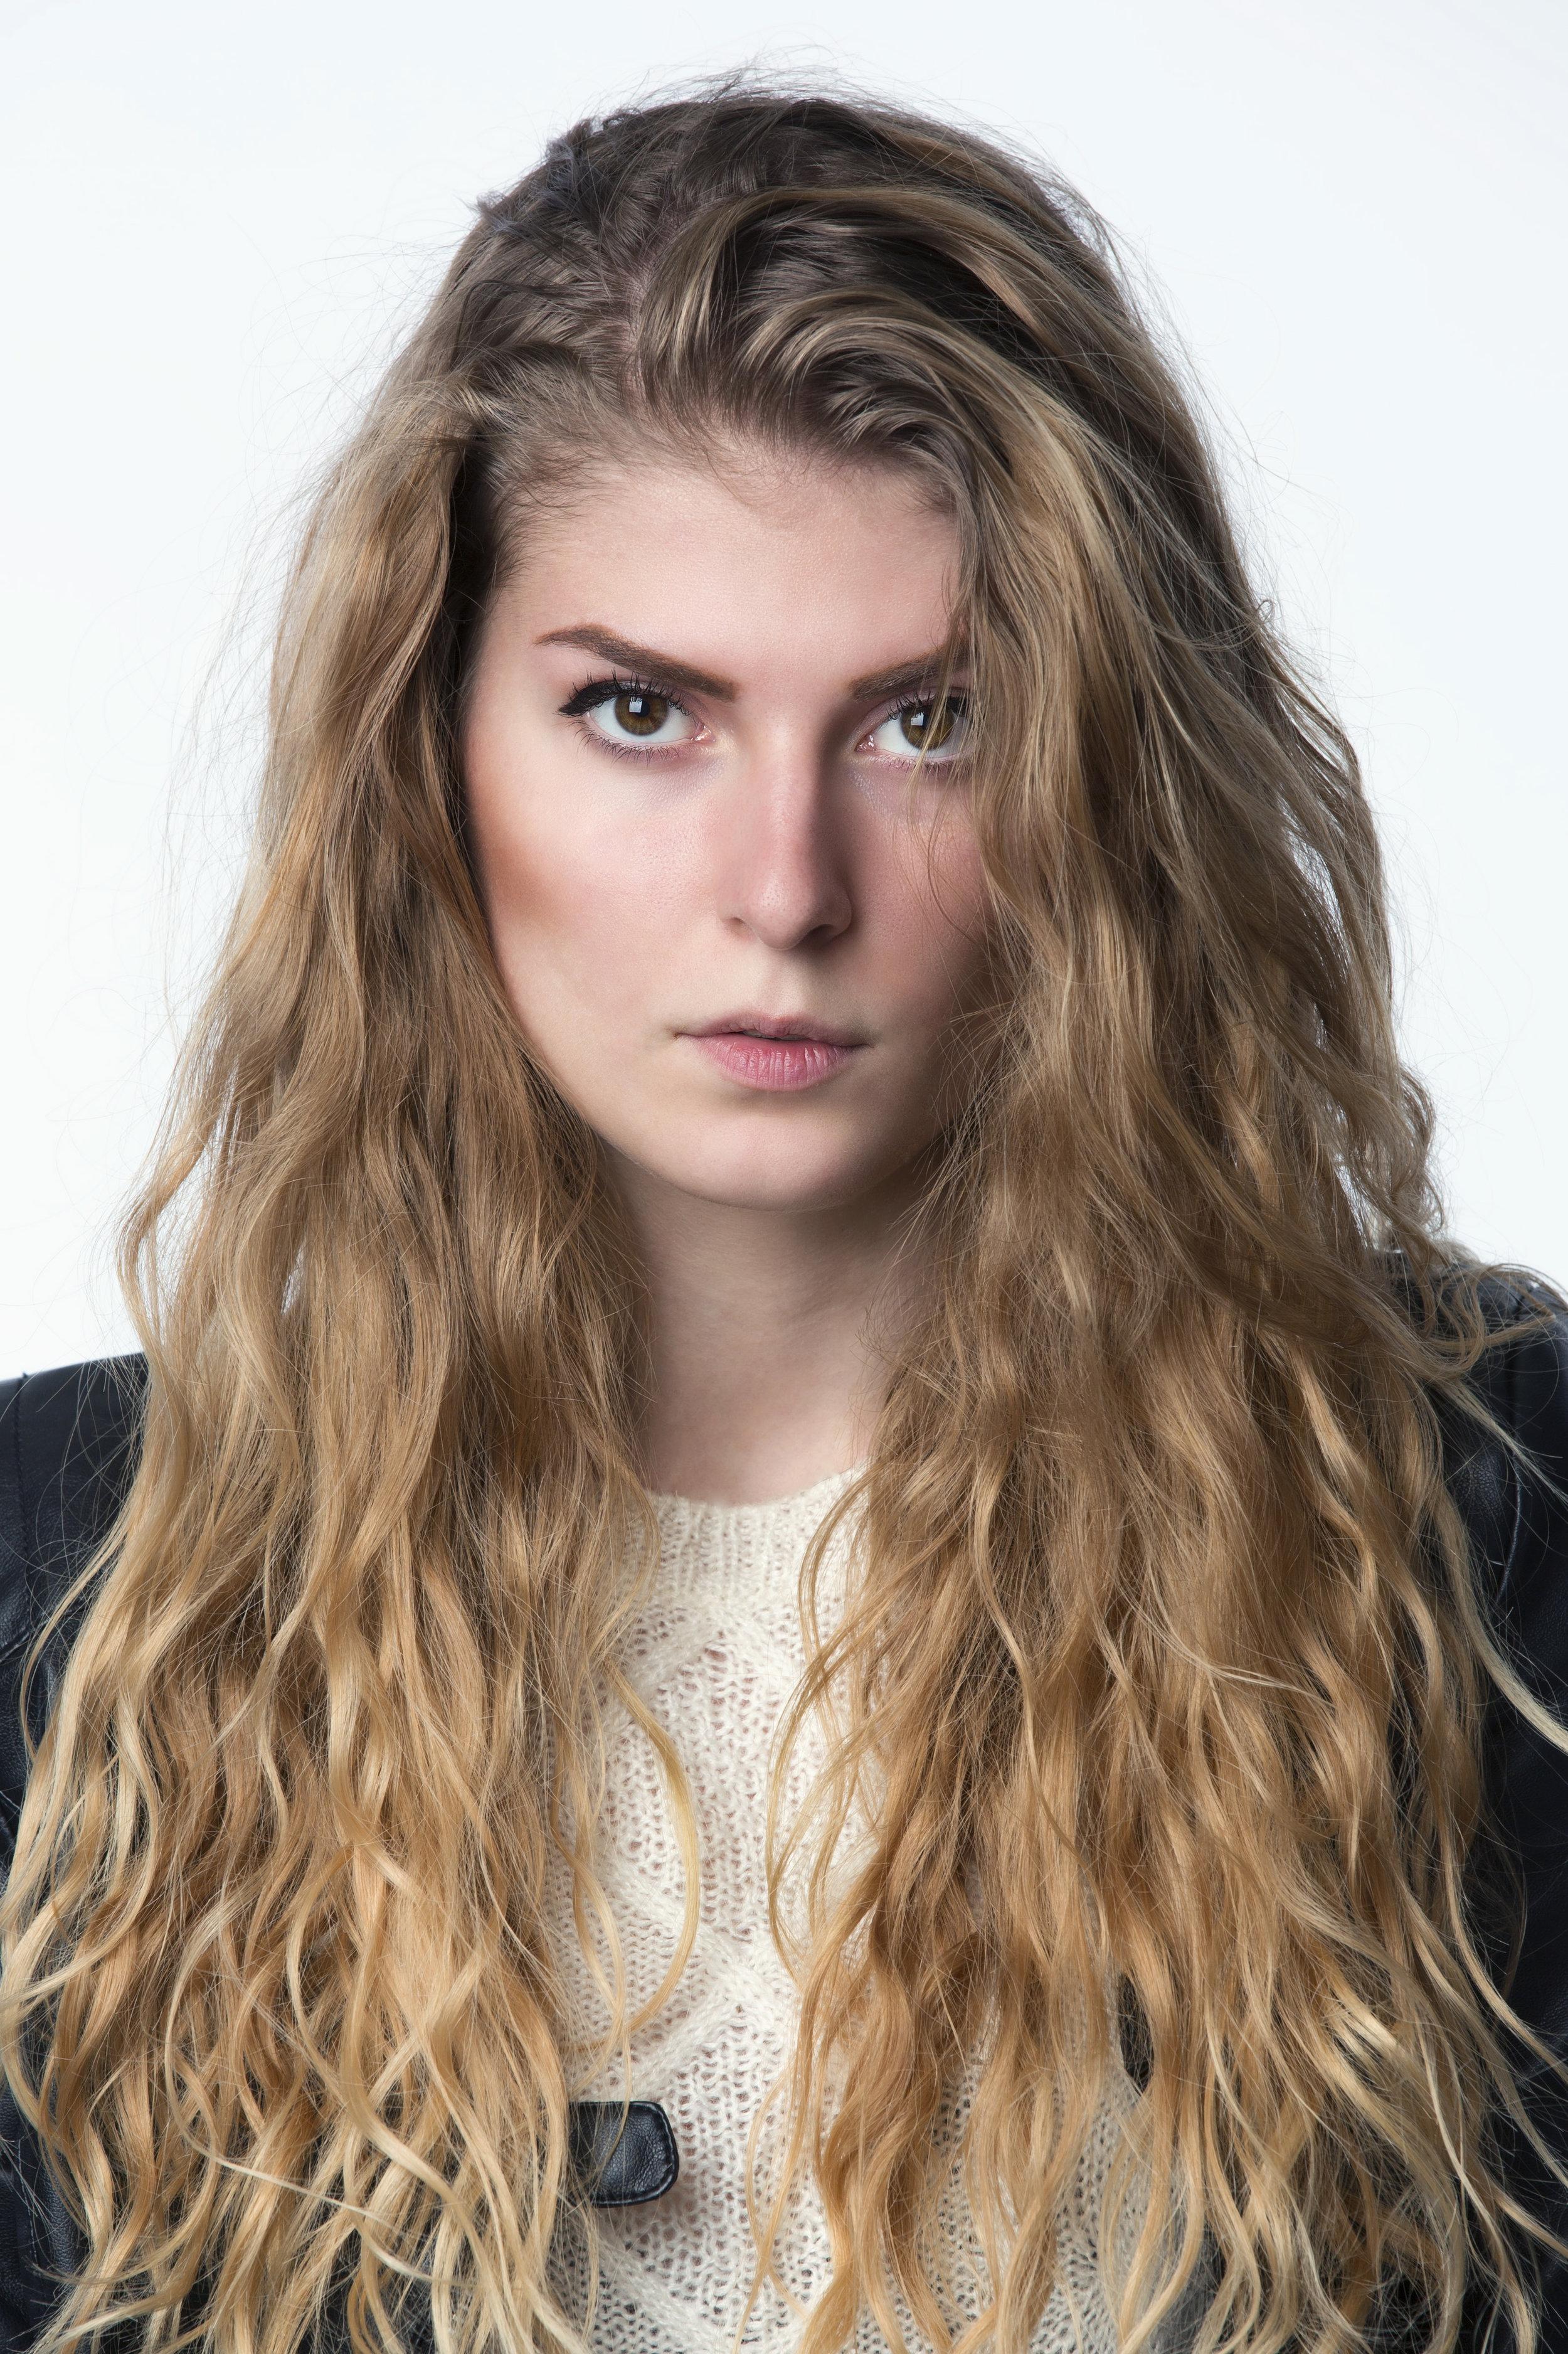 Joanna's Modelling Portfolio